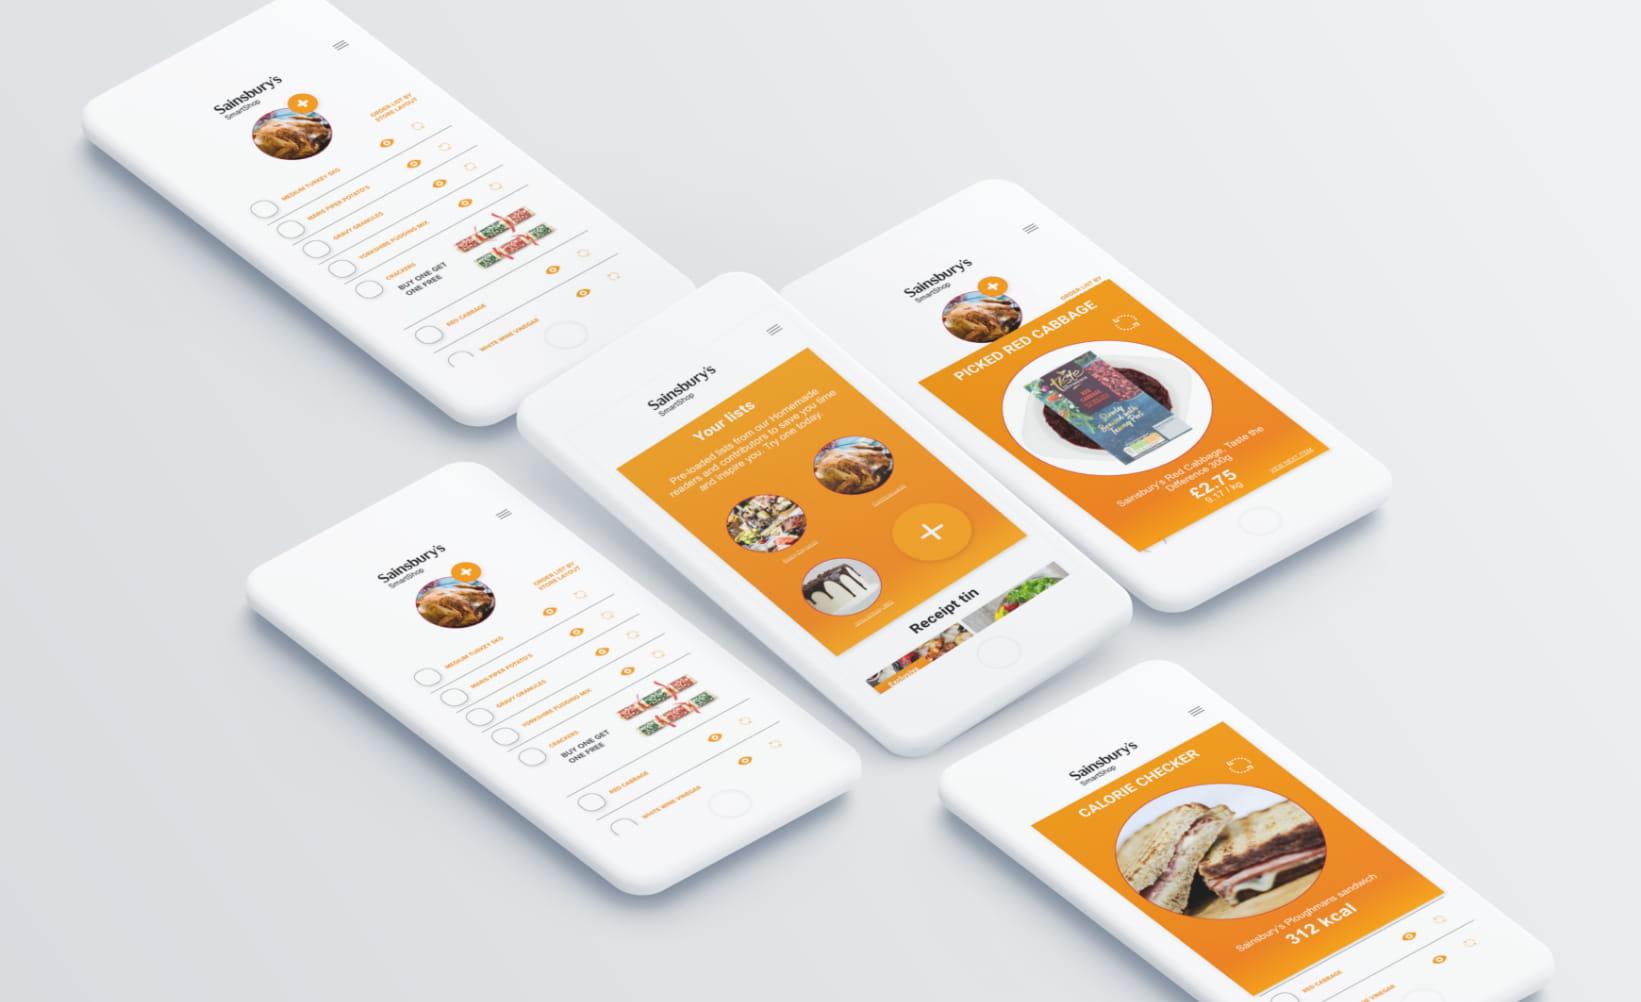 Sainsbury's service design development